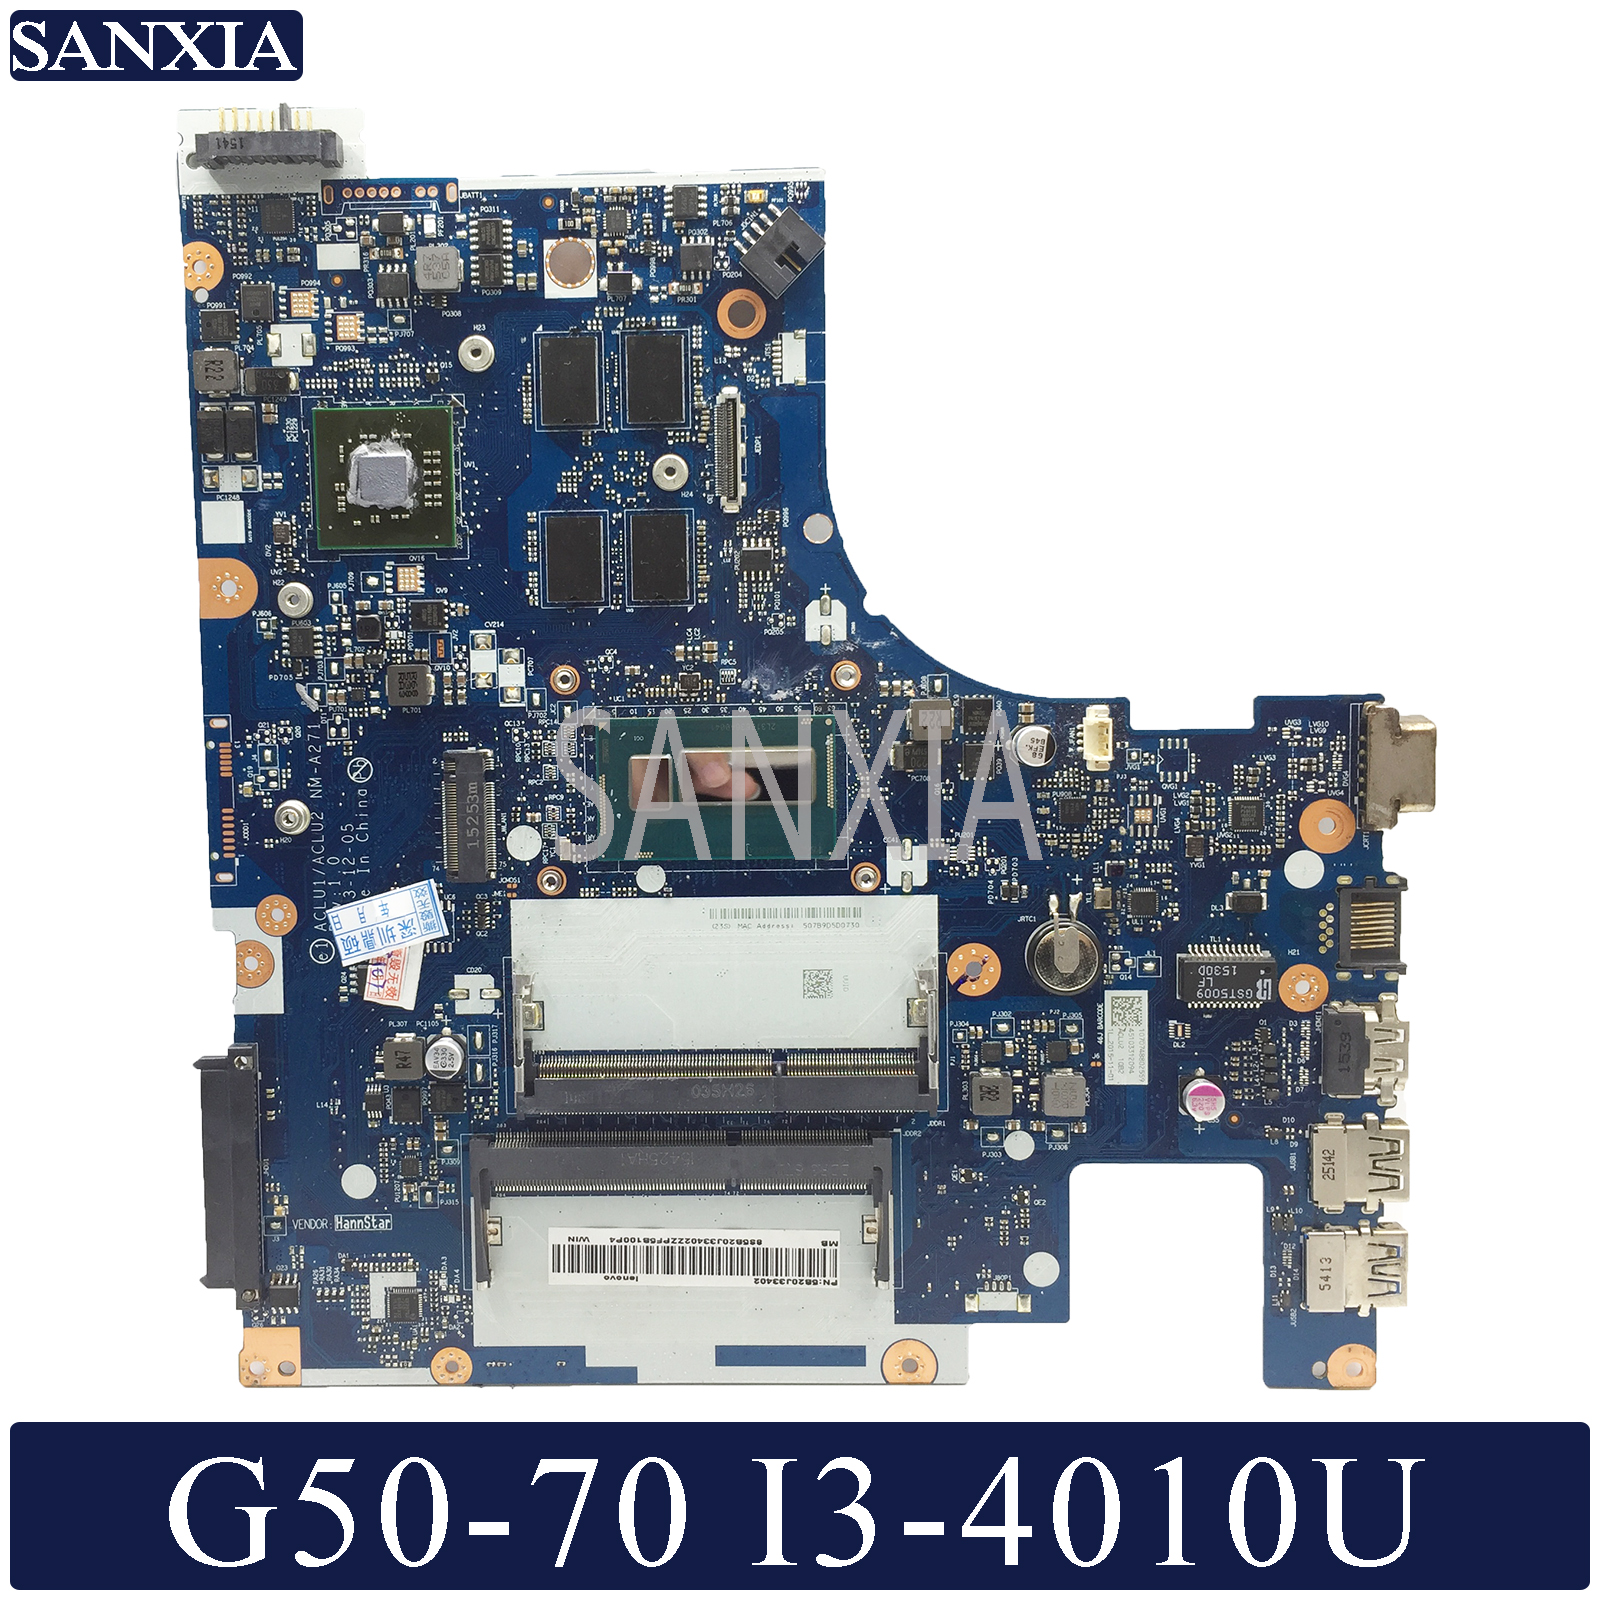 KEFU NM-A271 Laptop Motherboard For Lenovo G50-70 Original Mainboard I3-4010U